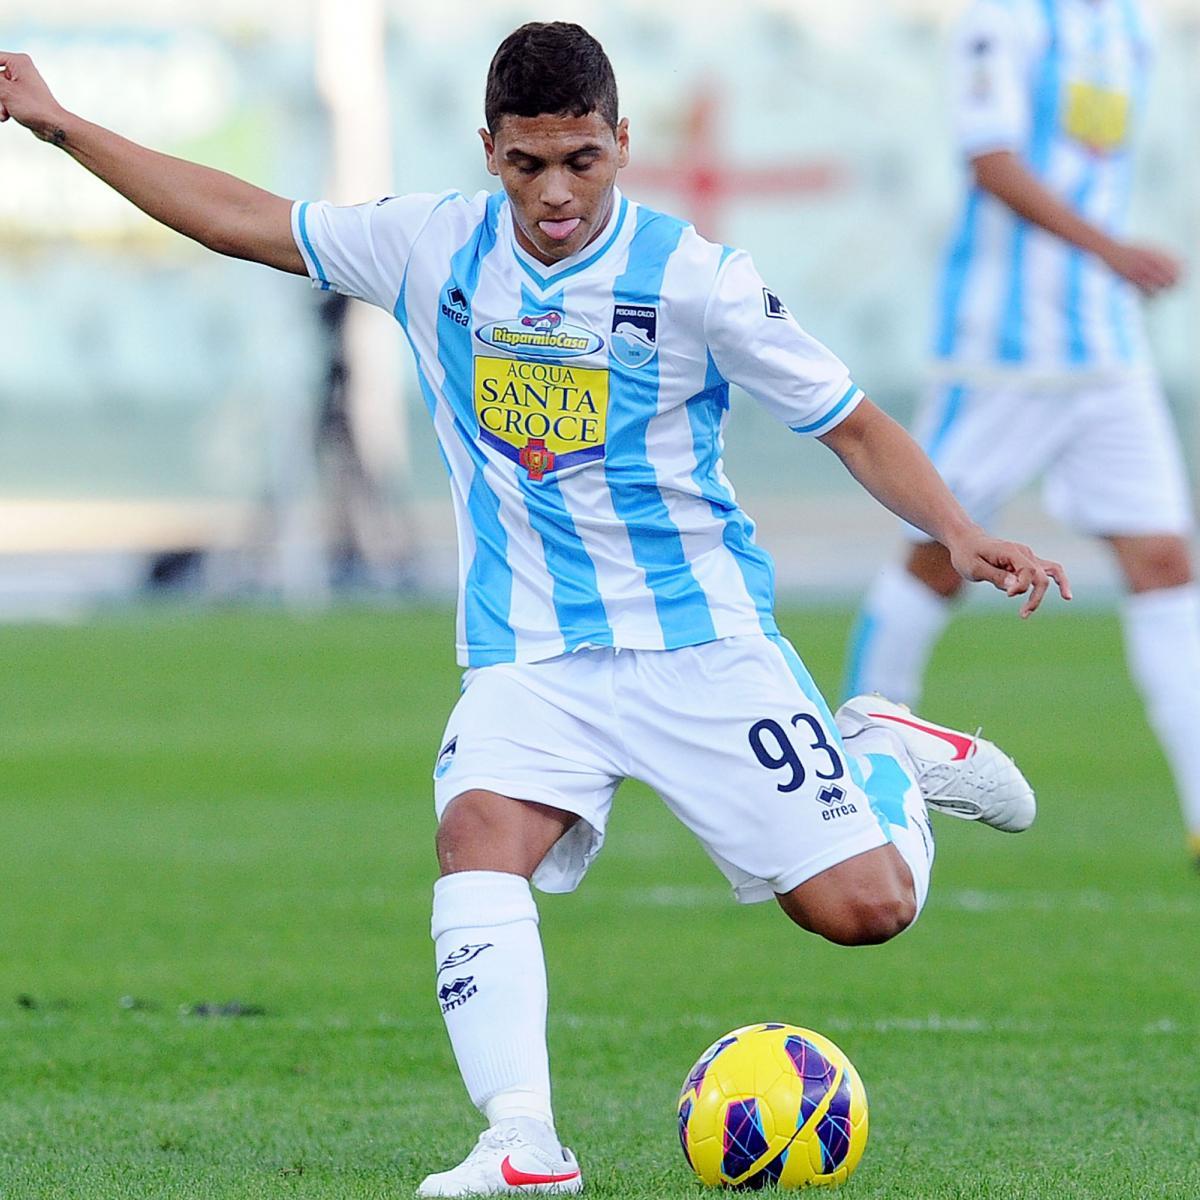 Psg Transfer News Latest On Lucas Moura Top Rumours: Manchester United Transfer Rumours: Juan Fernando Quintero